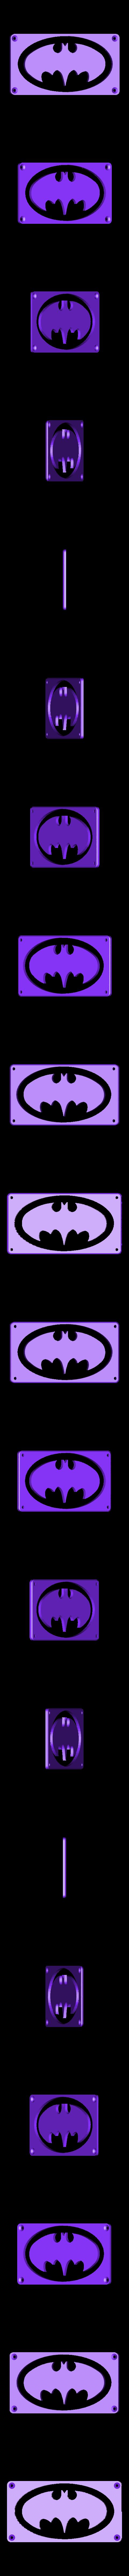 BatMan_Plate.STL Download free STL file BATMAN LED Light/Nightlight • 3D print design, Balkhagal4D